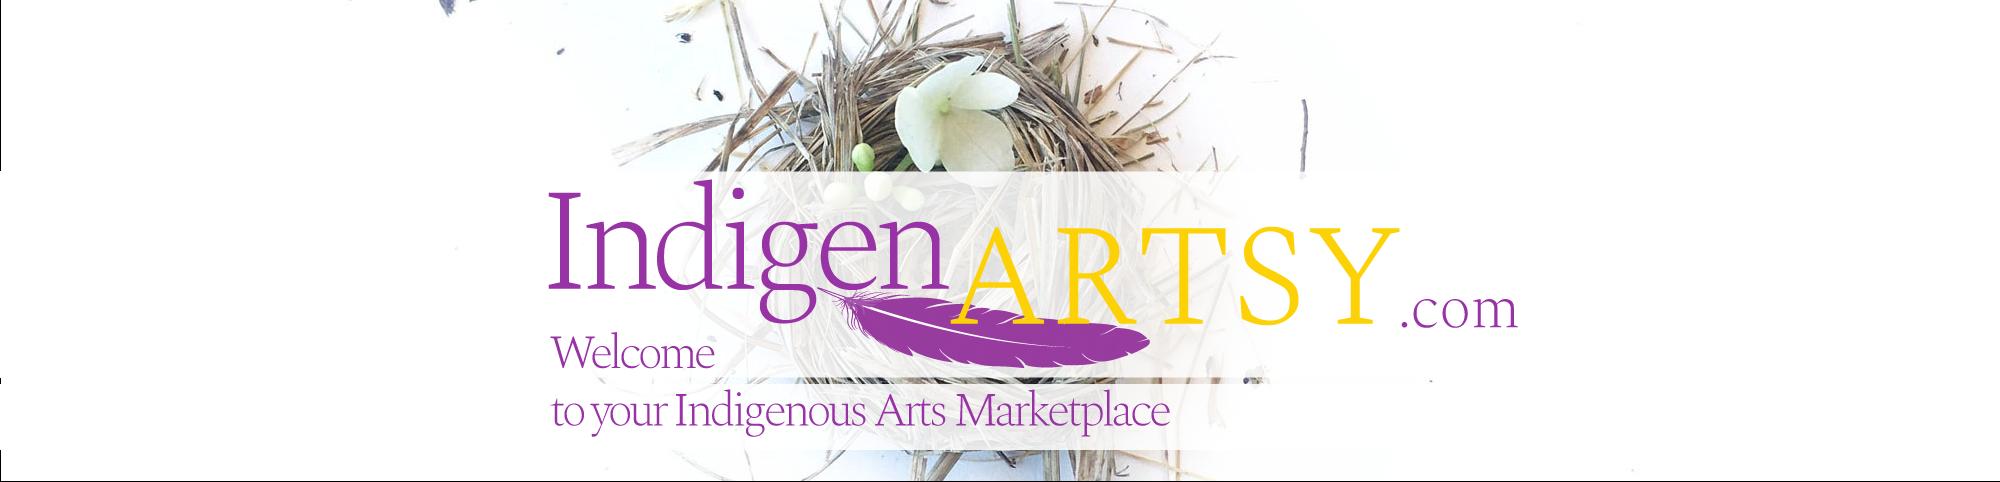 Indigenartsy, marketplace, indigenous arts, native arts, first nations art